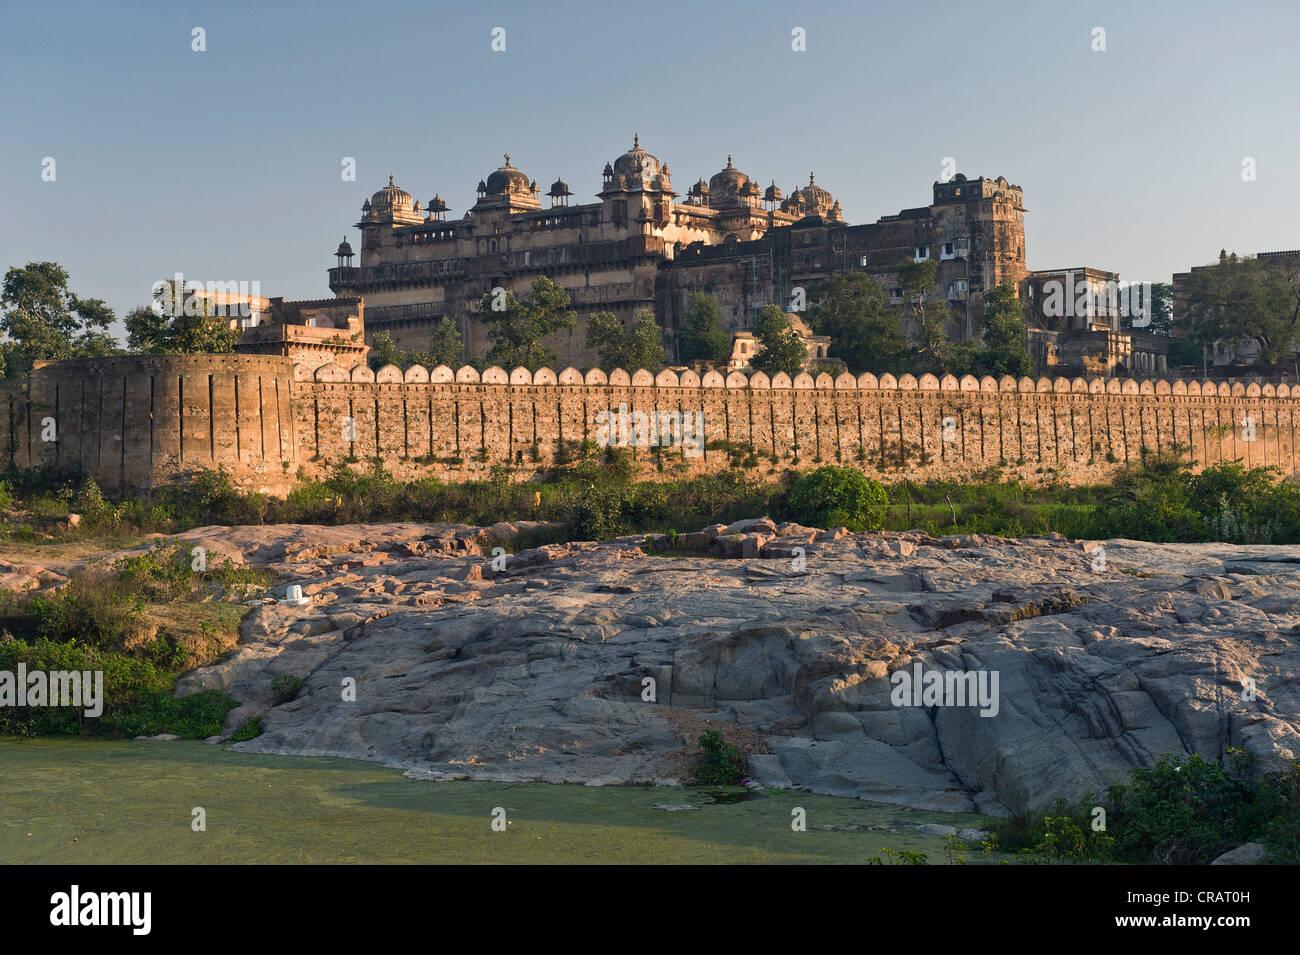 Raj Mahal Palast, Orchha, le Madhya Pradesh, Nordindien, Indien, Asien Photo Stock